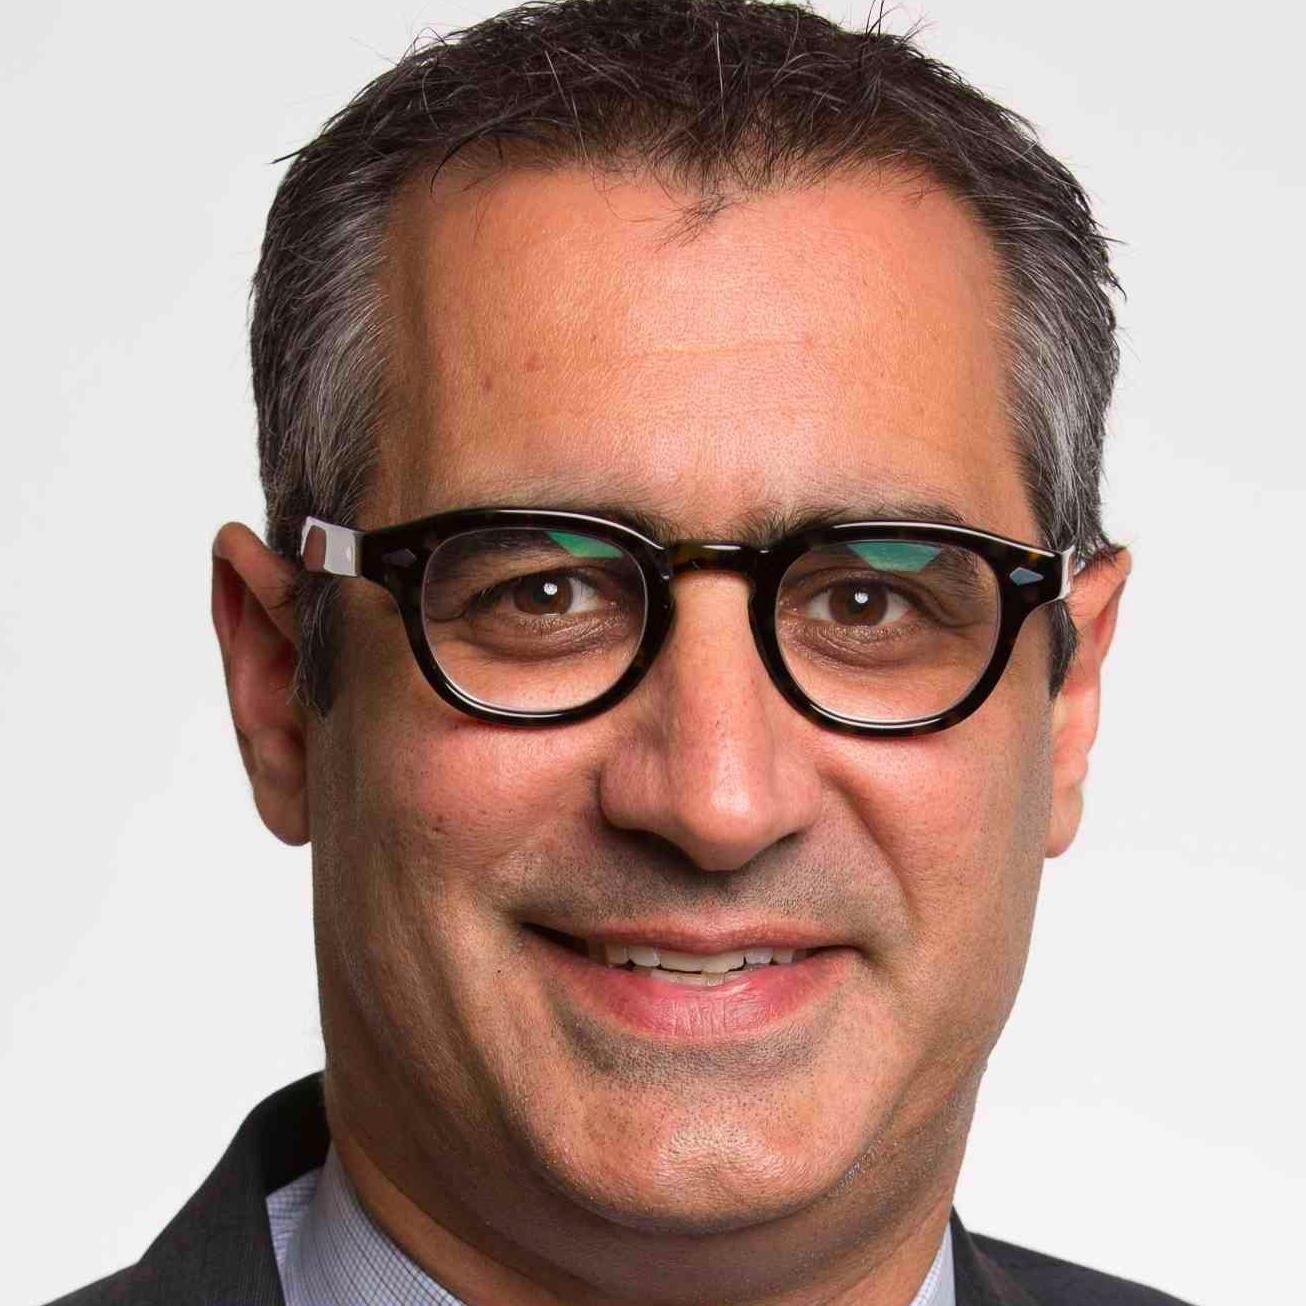 Michael Idinopulos